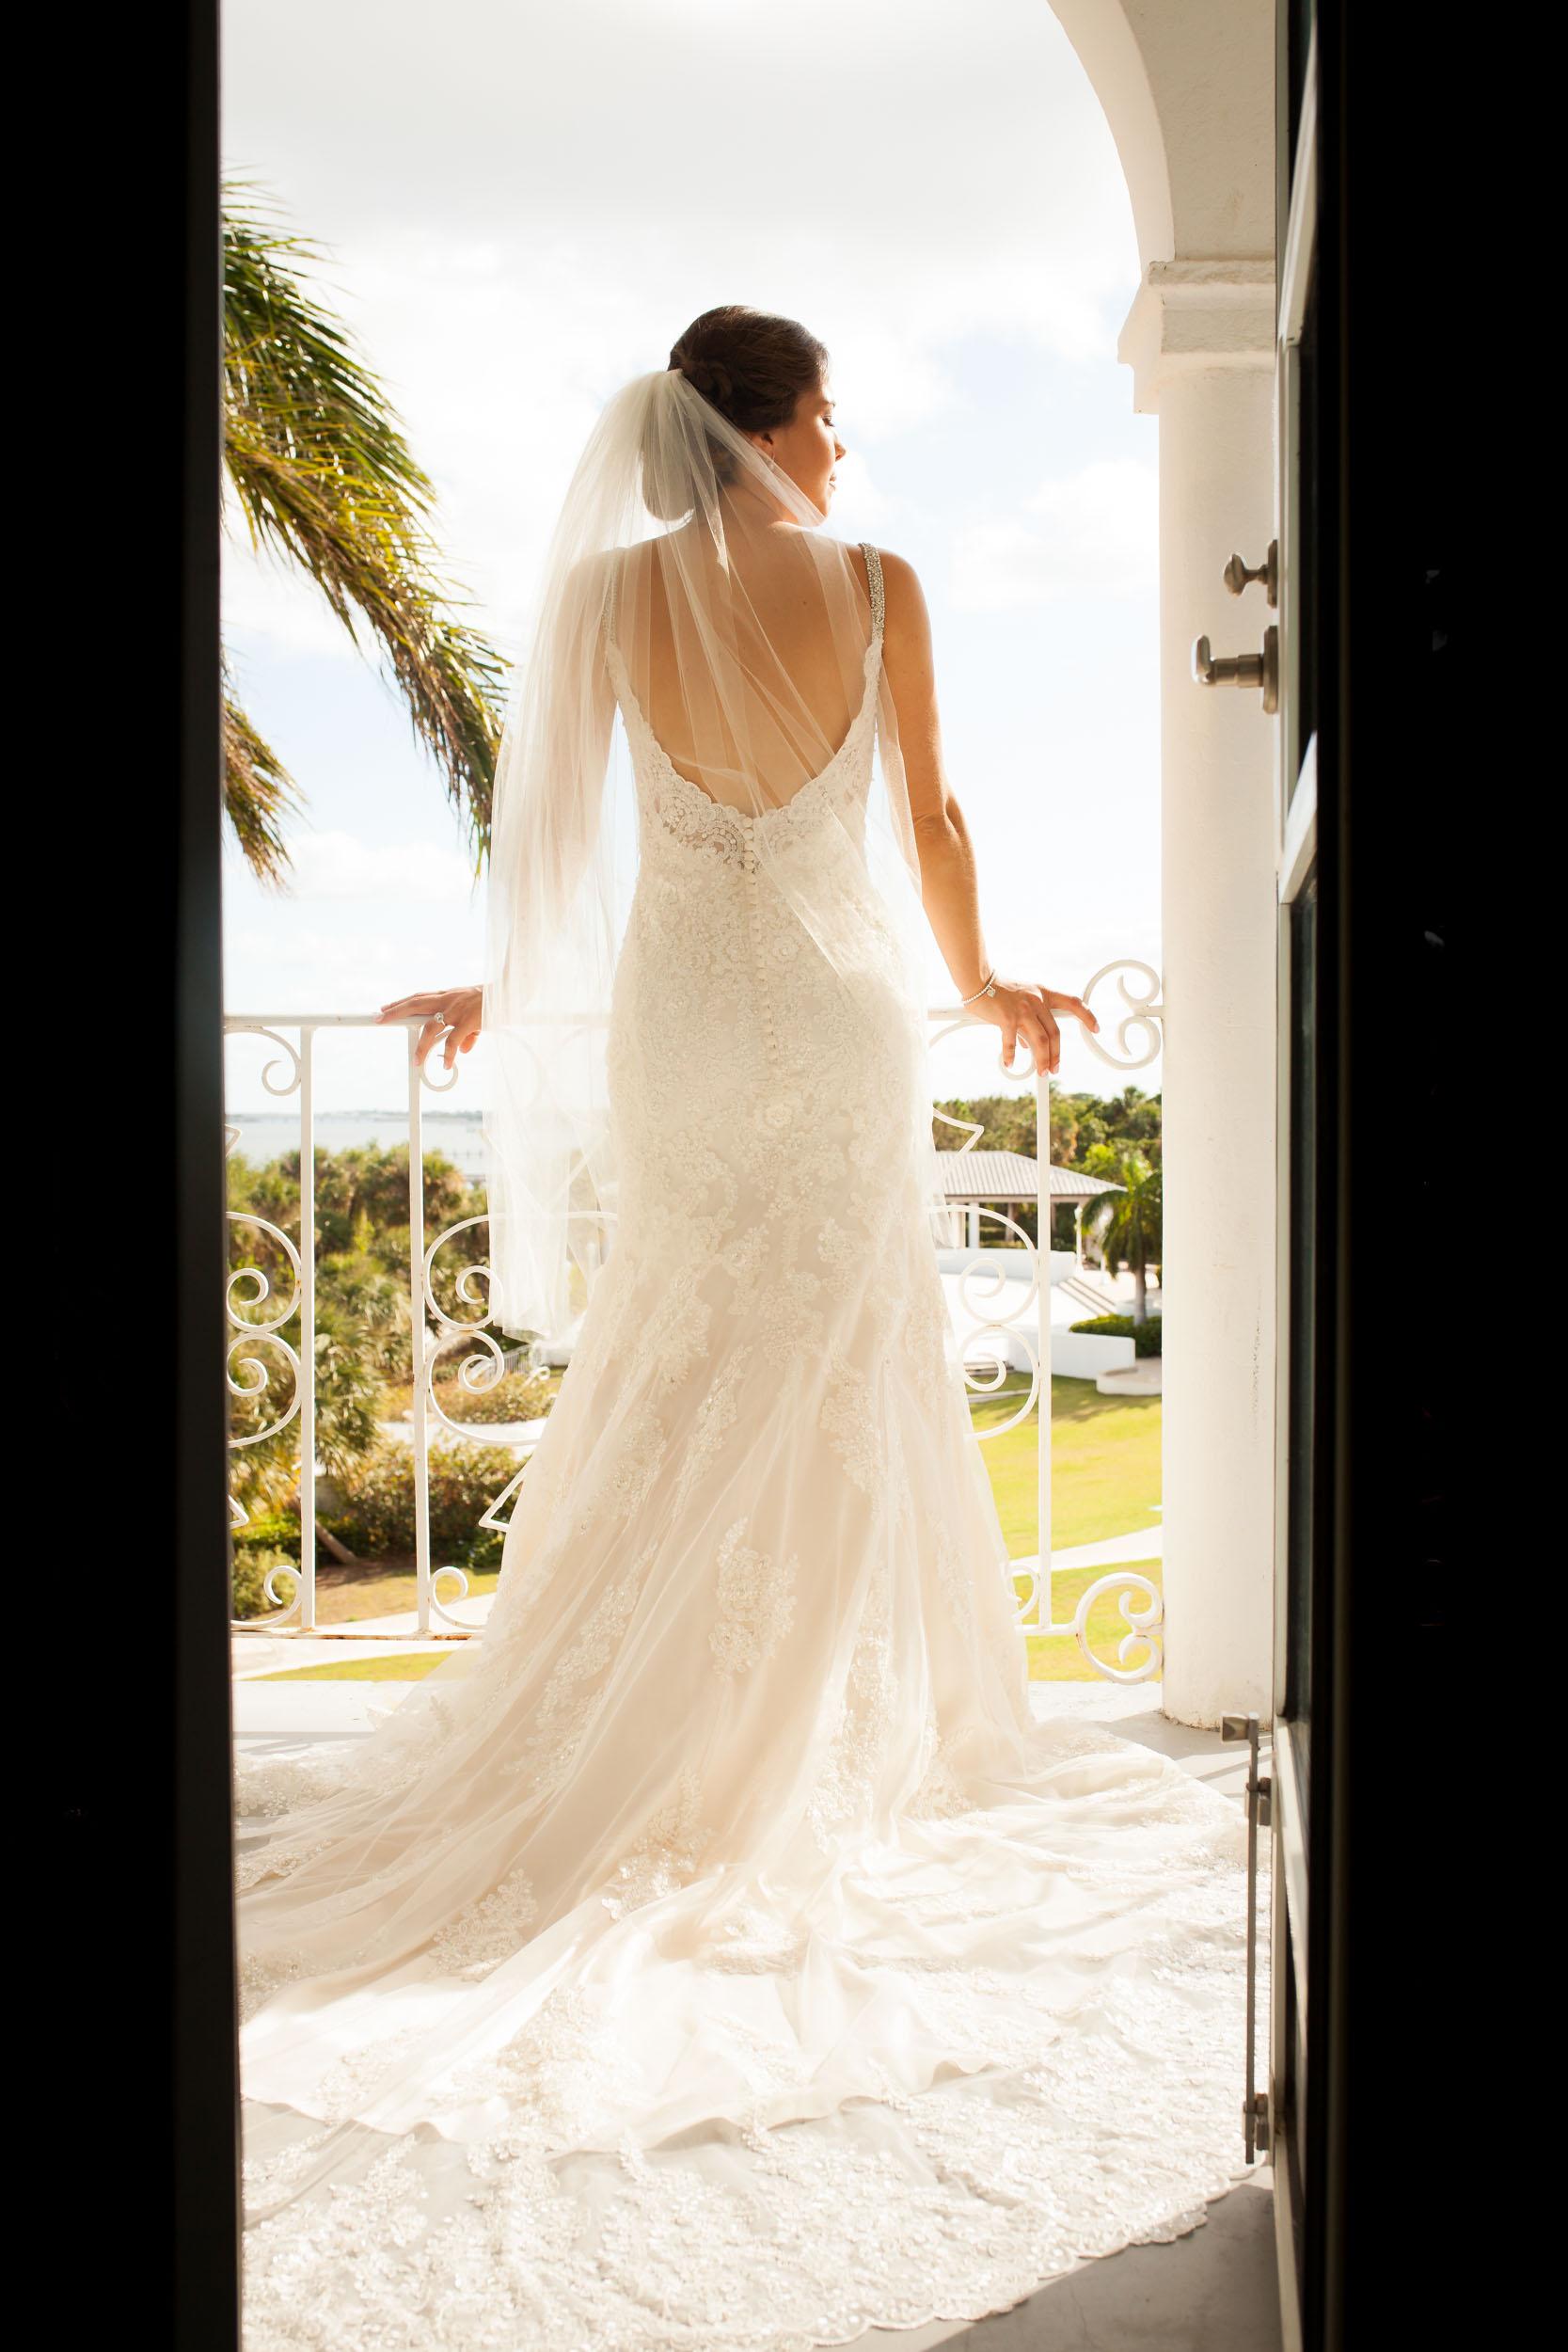 Flordia-Wedding-Photography-33.jpg